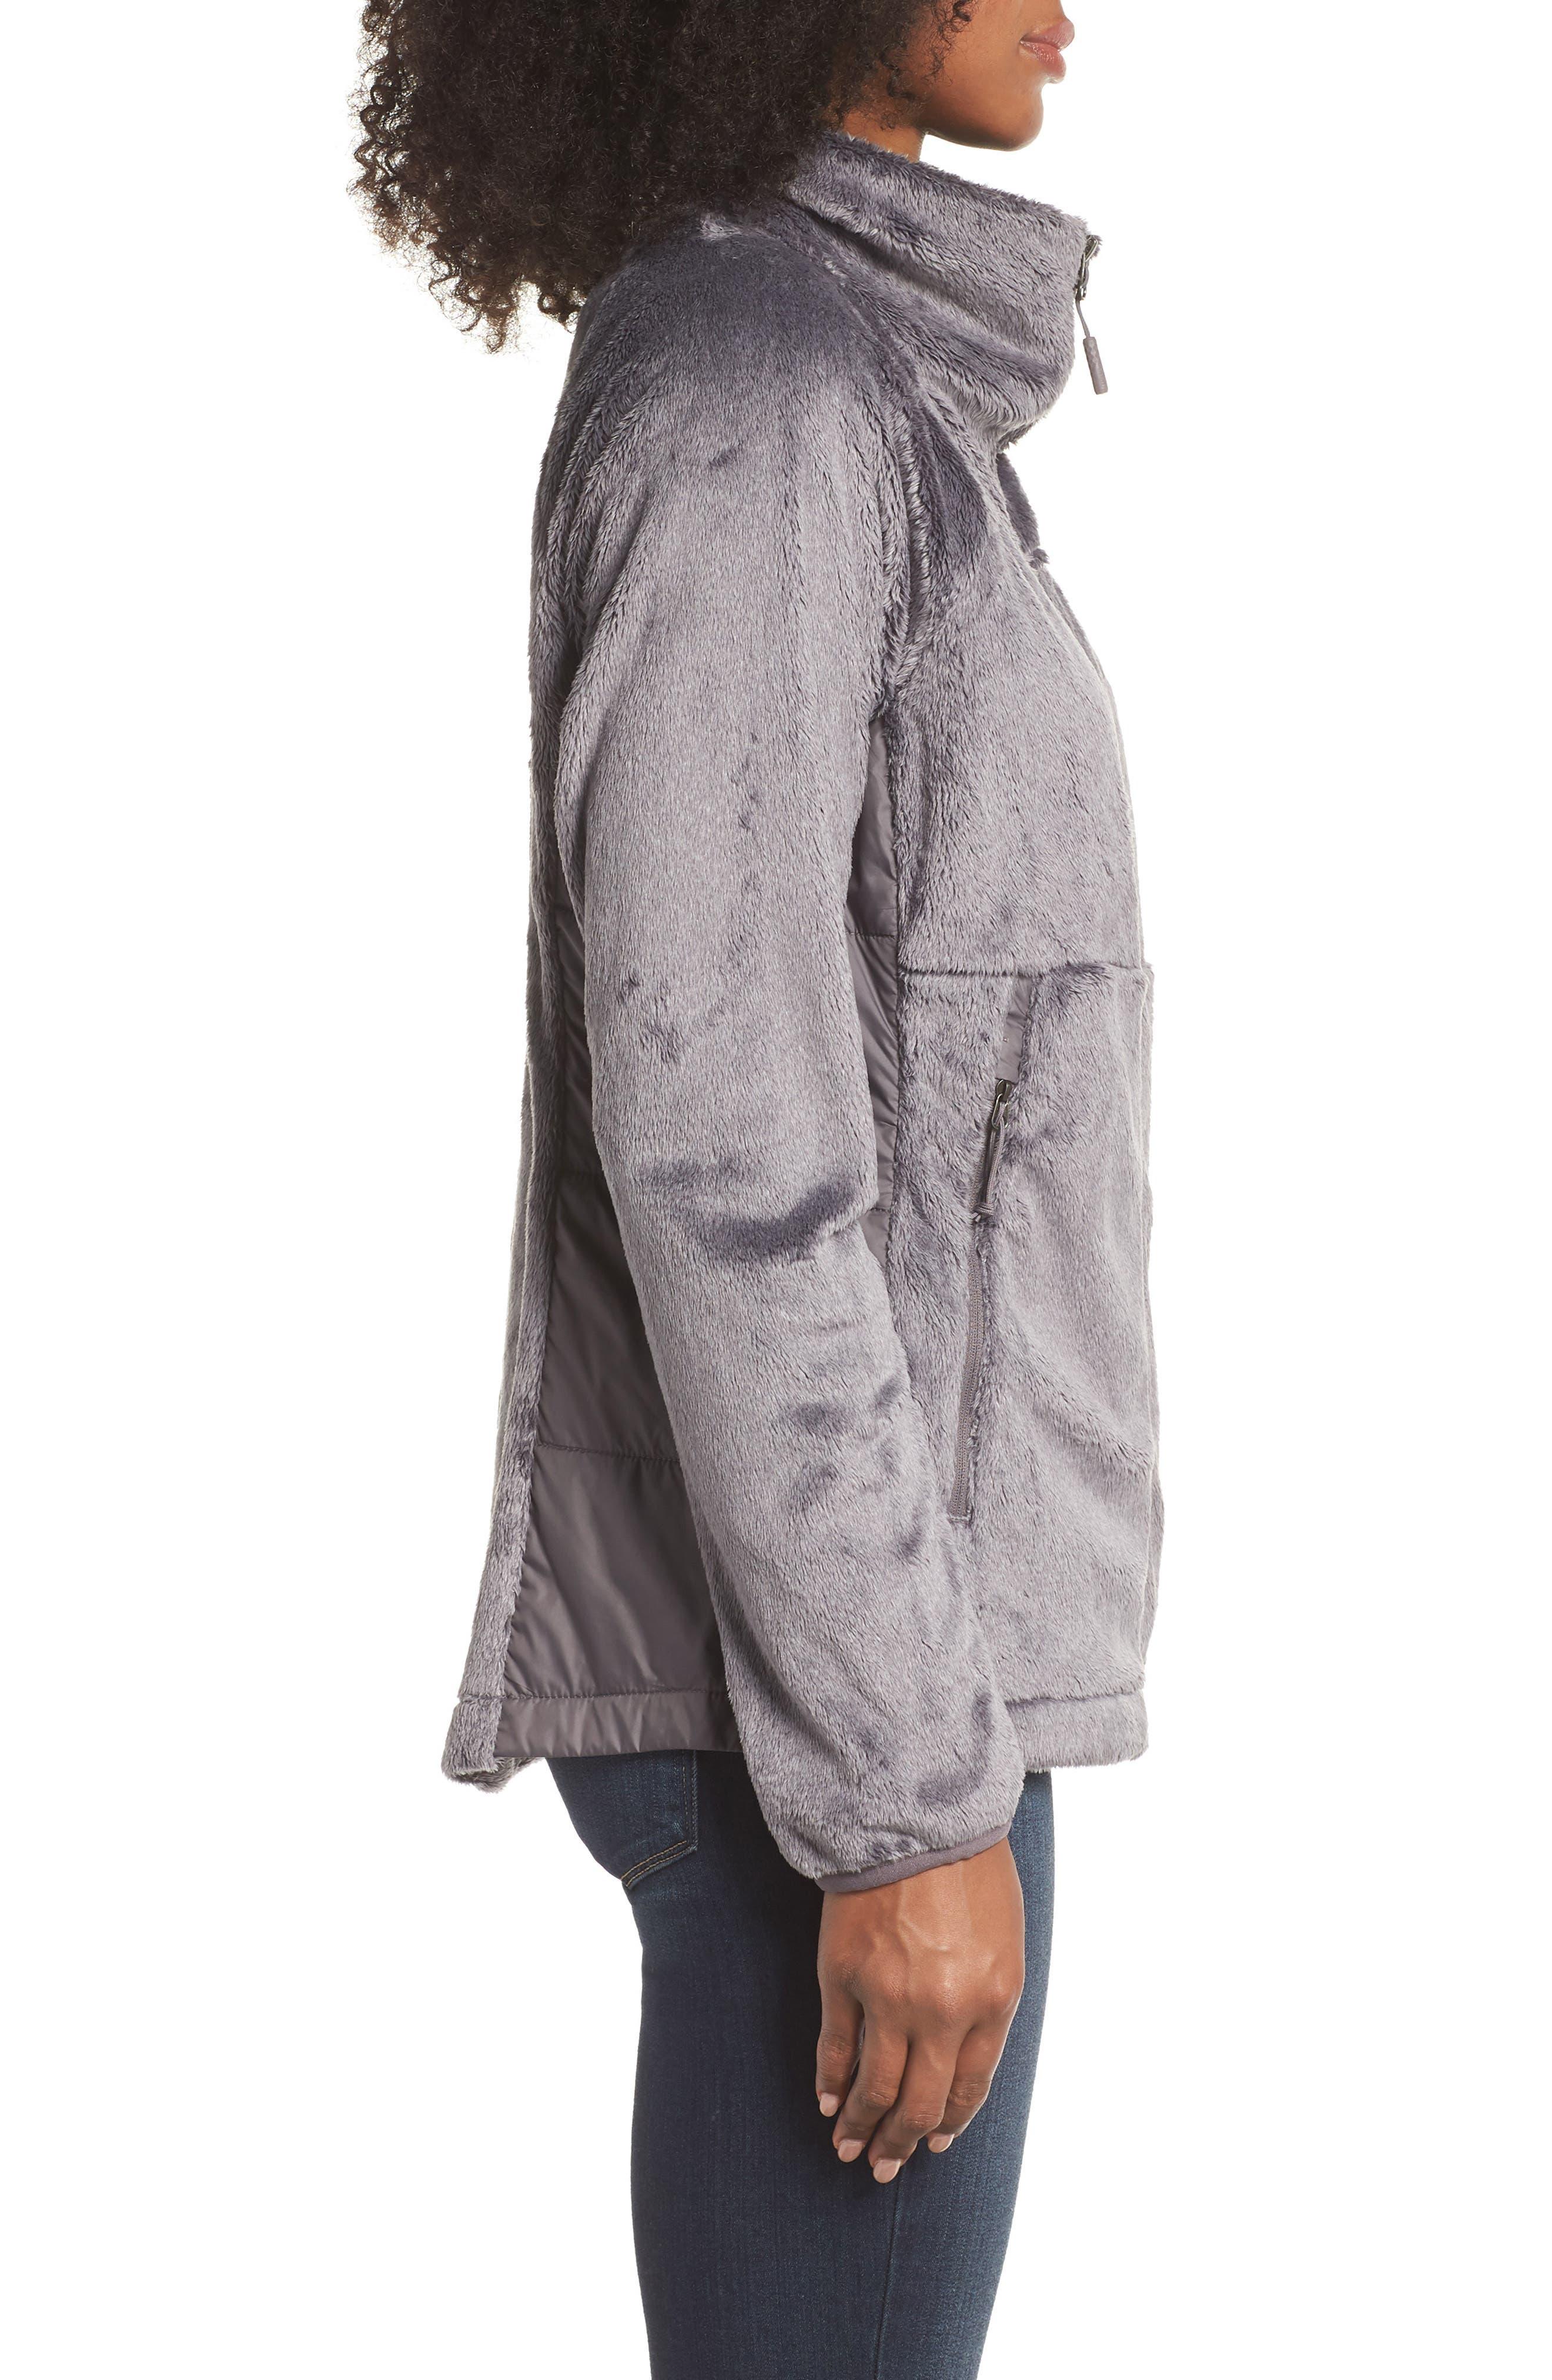 THE NORTH FACE, Osito Sport Hybrid Jacket, Alternate thumbnail 4, color, RABBIT GREY HEATHER